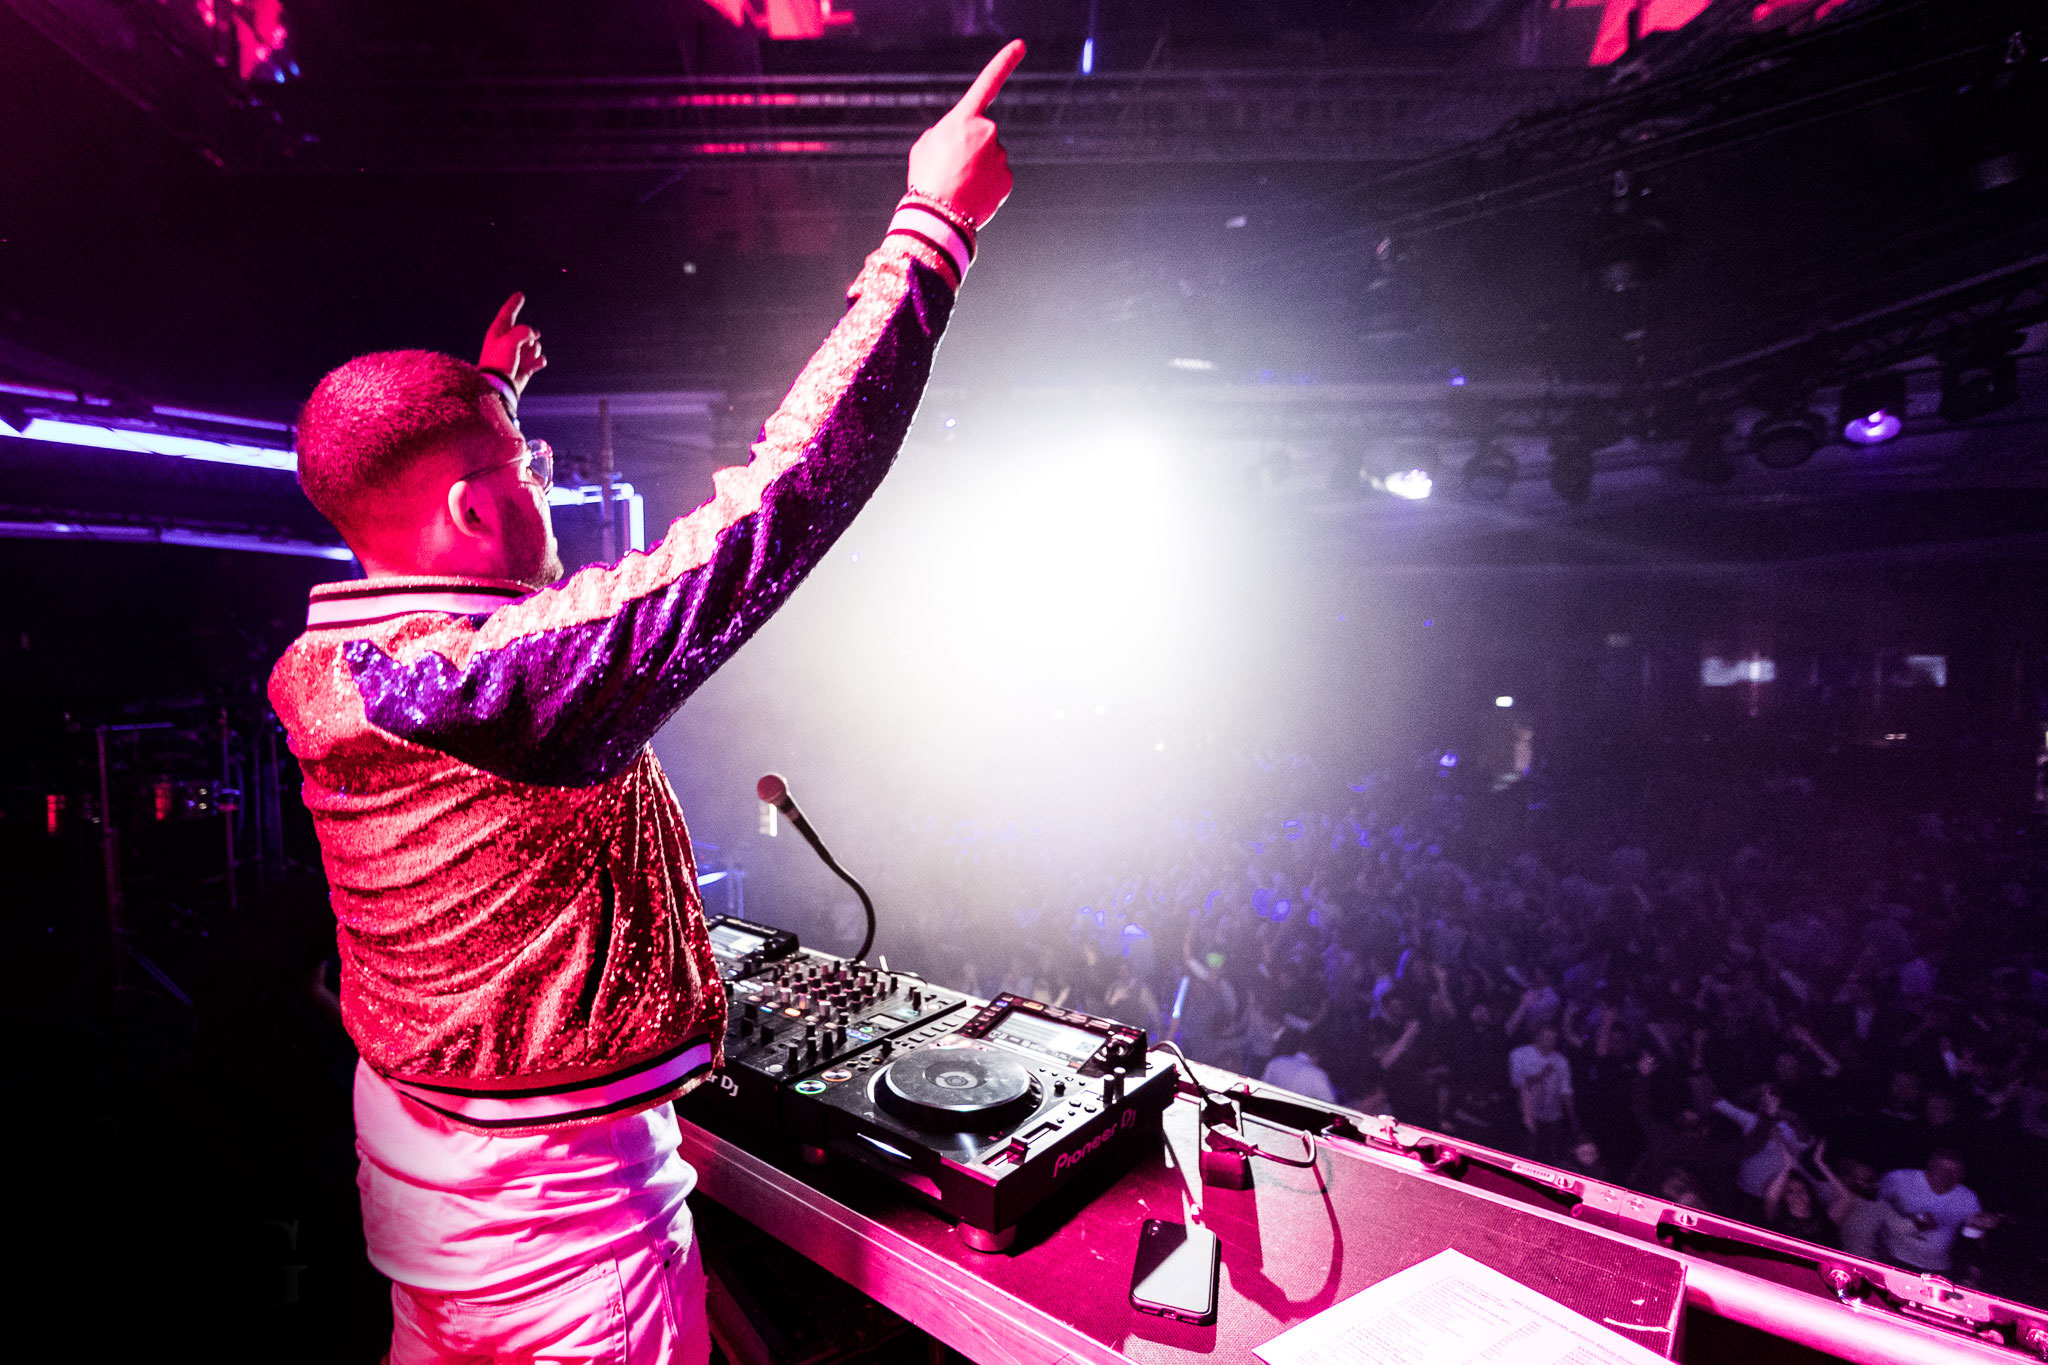 FRESH_MUSIC_LIVE_DJ_NSURE_06